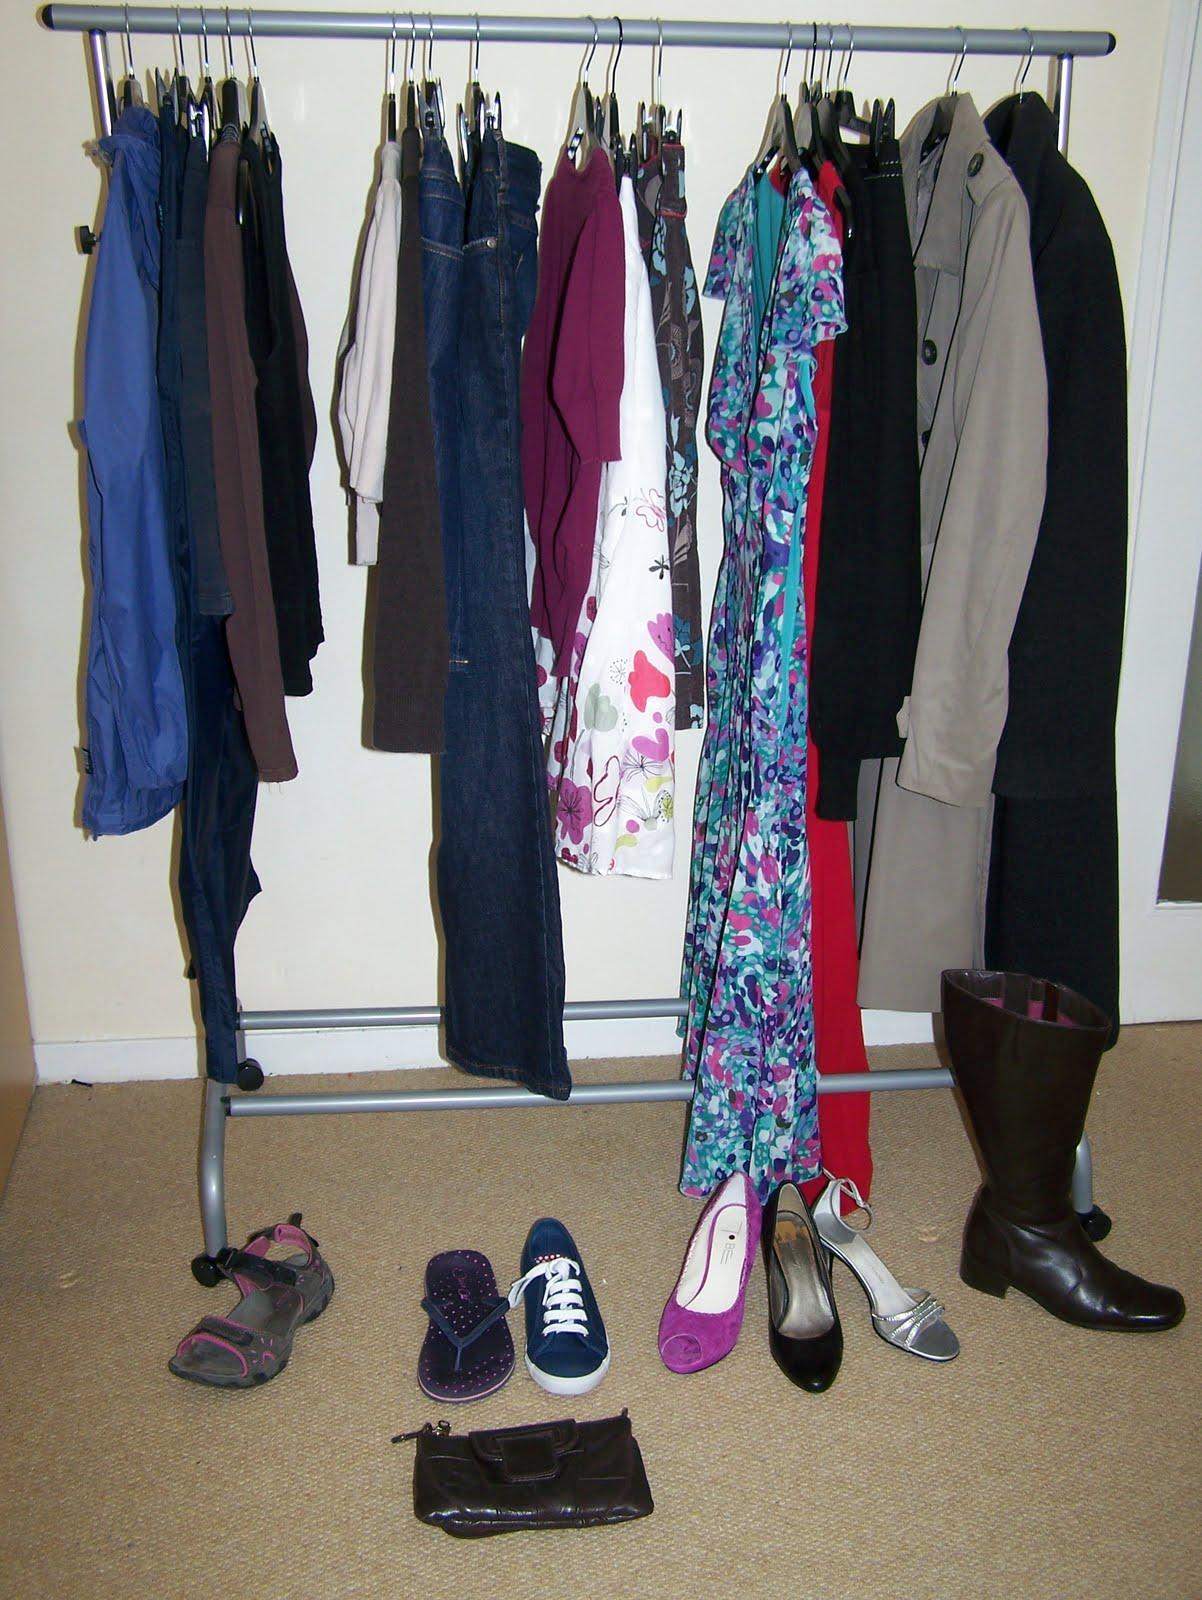 http://1.bp.blogspot.com/-Z0vvrYNIeNU/TjxfTU39OGI/AAAAAAAAACM/5Ar6jyID-DM/s1600/minimalist+wardrobe+007.jpg